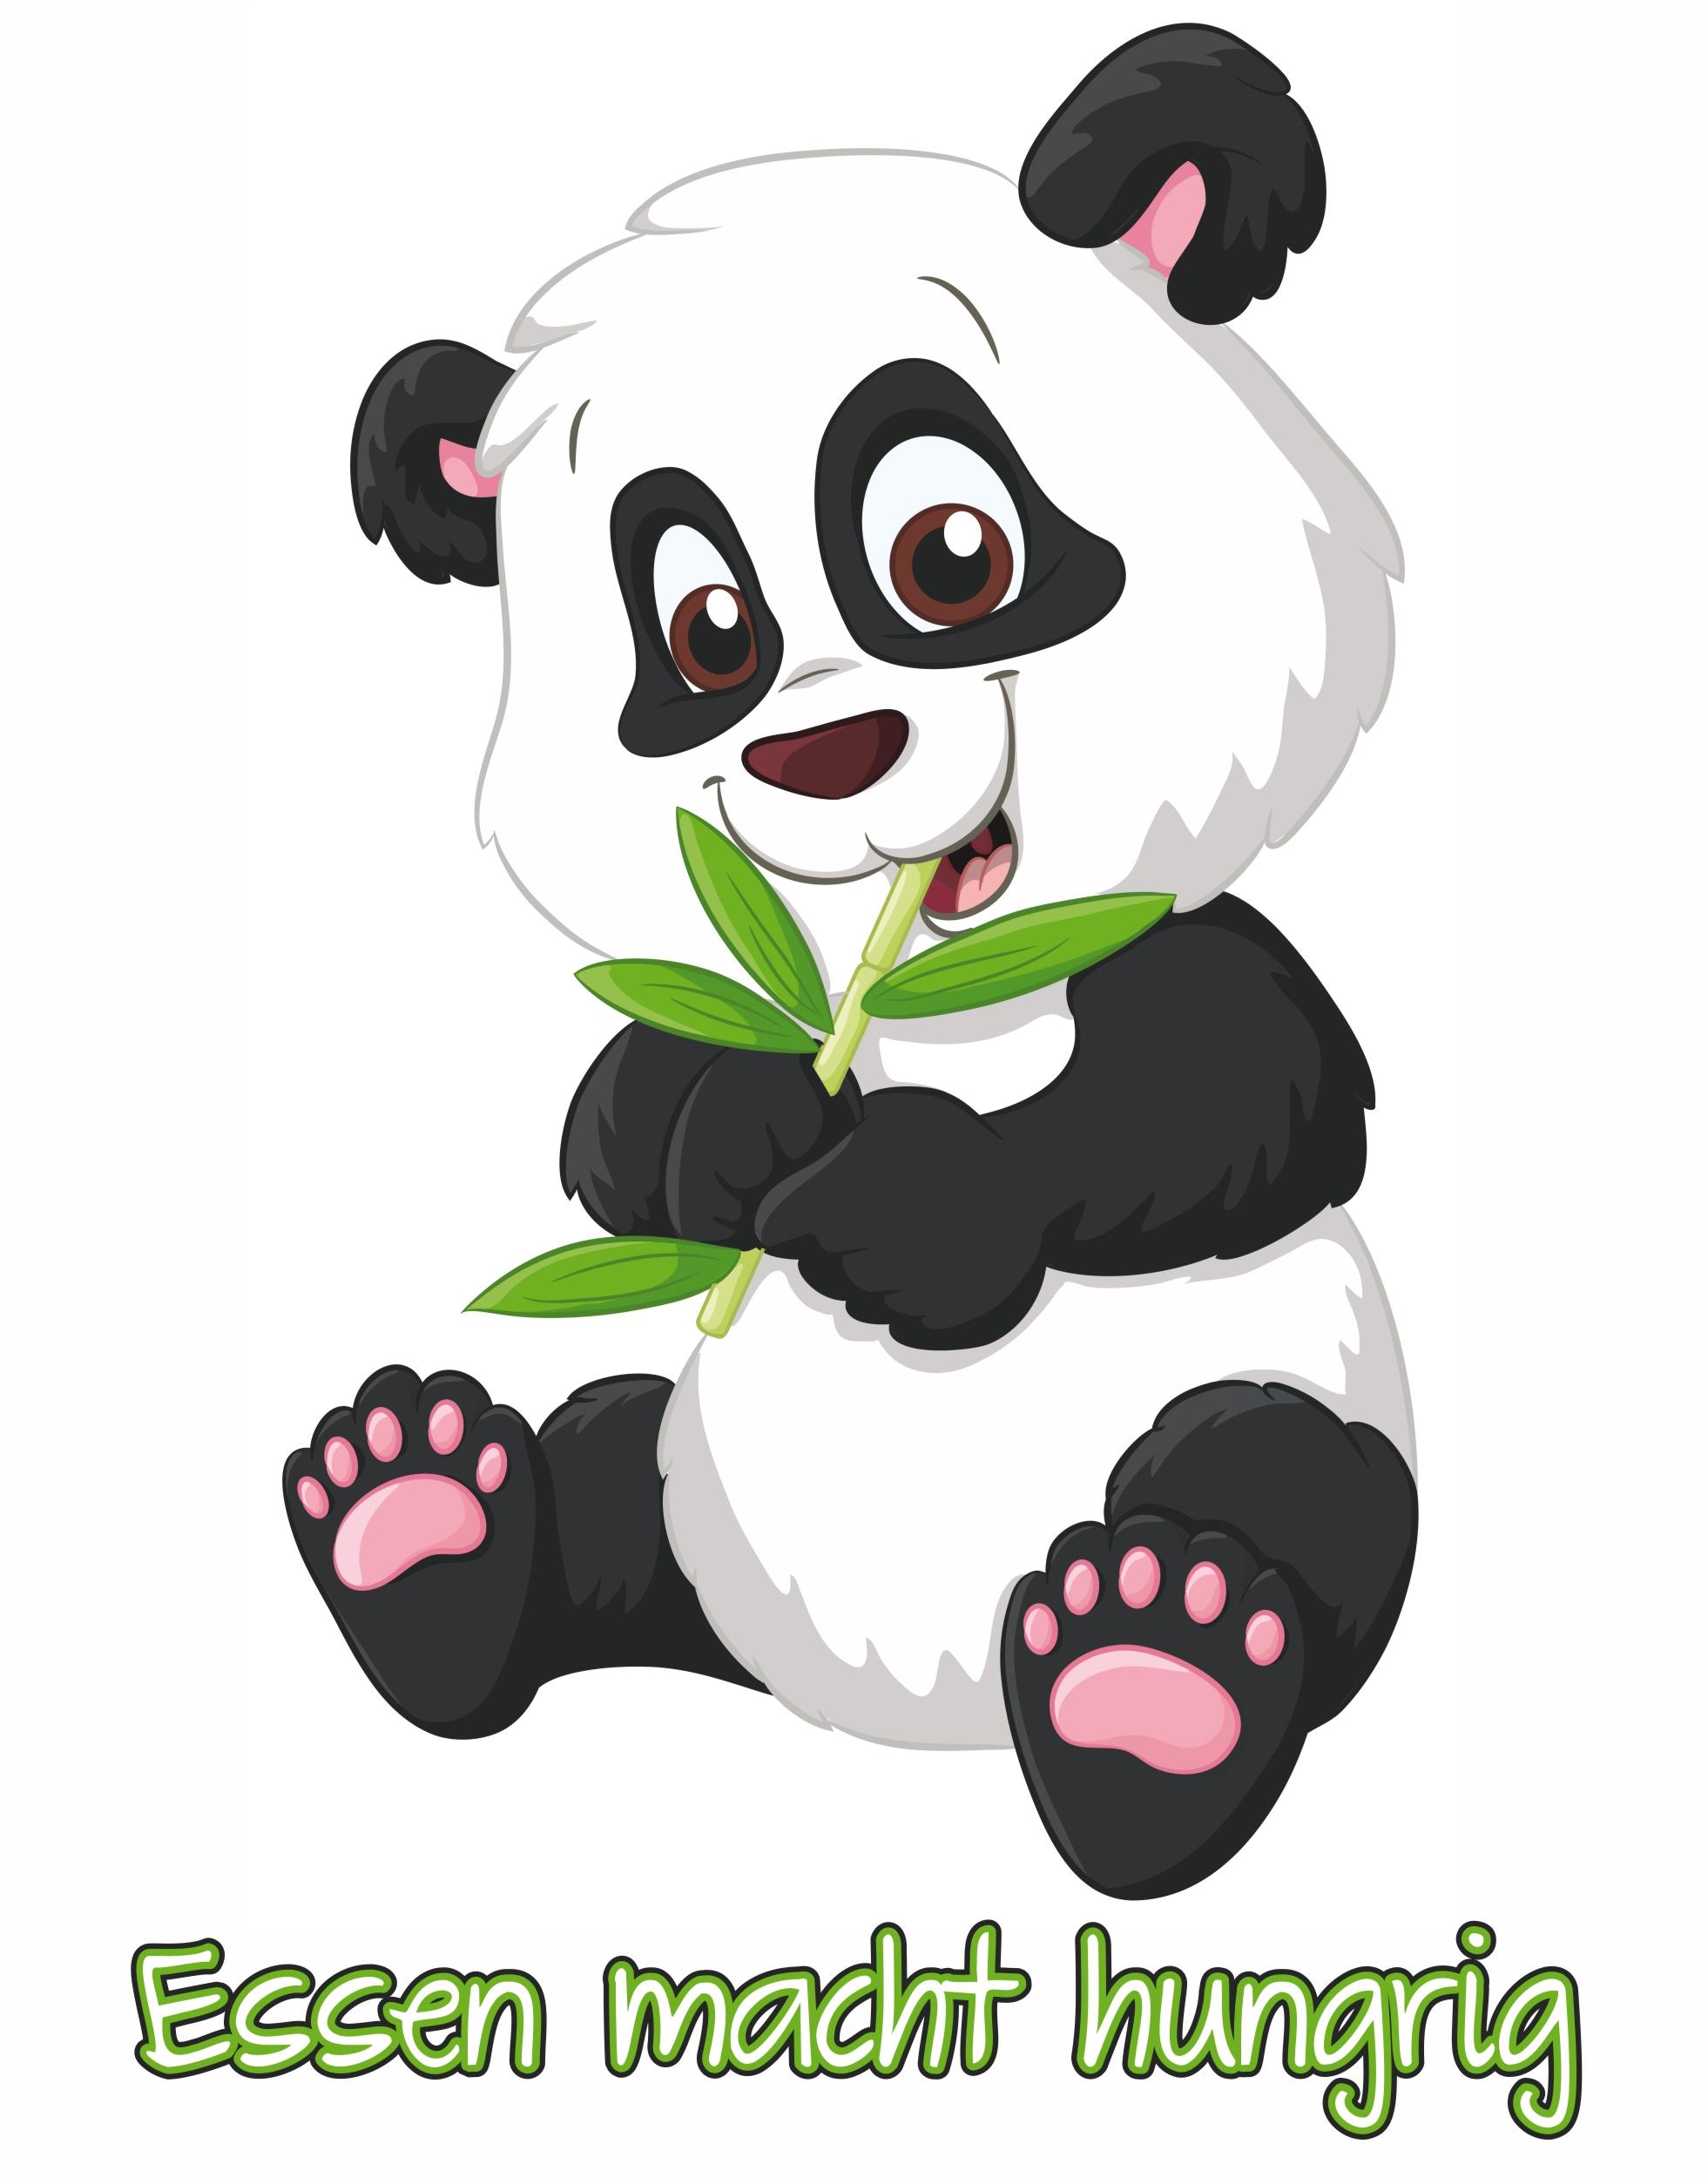 "Autocollant panda"" Essen macht hungrig"" 150 x 115 mm"